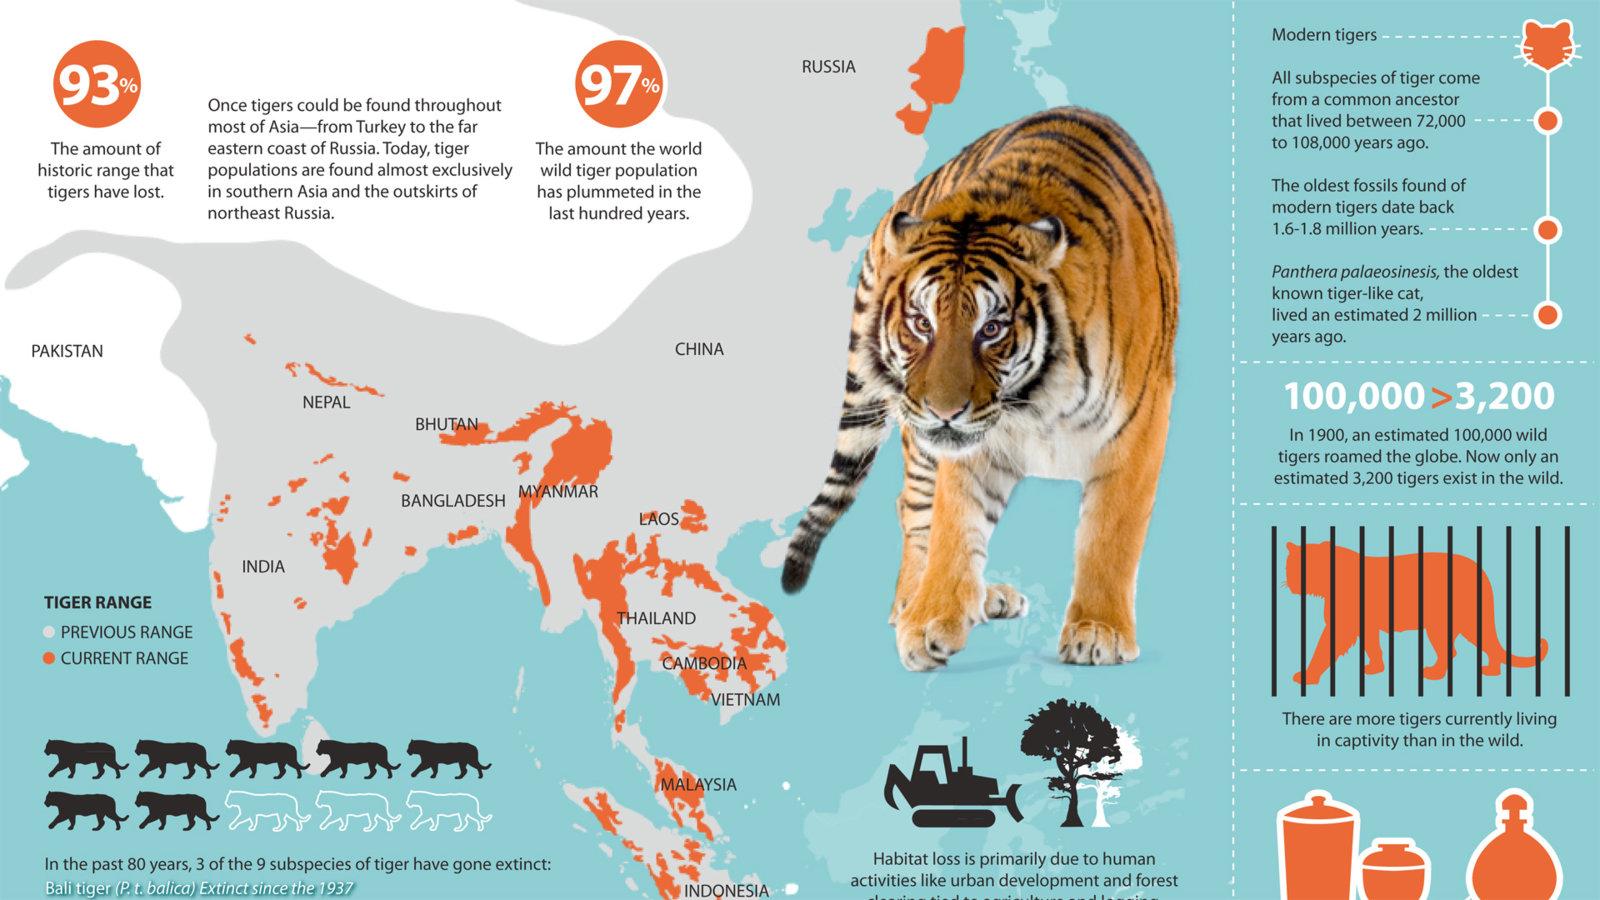 TigerInfographic2-Main.jpg